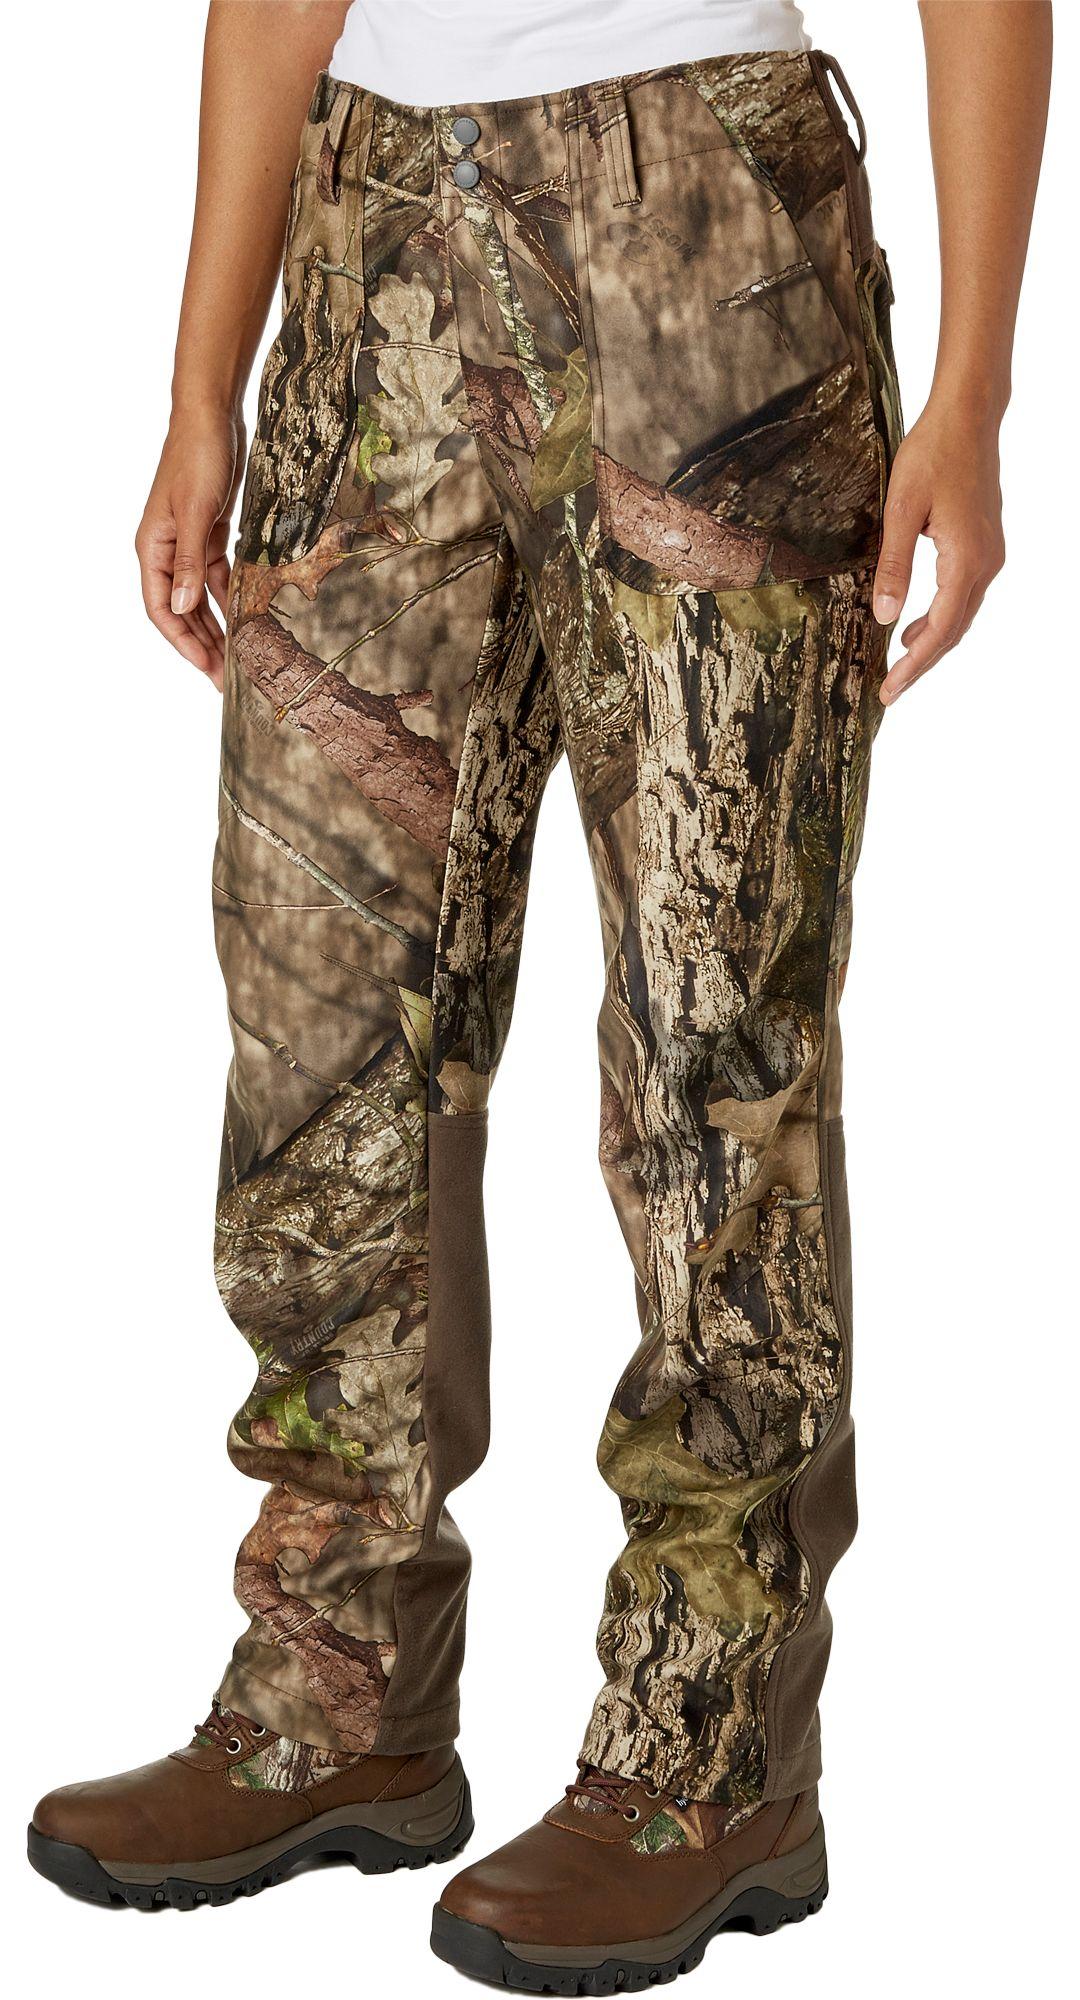 e2b9491335568 Field & Stream Women's Every Hunt Softshell Hunting Pants   Field ...